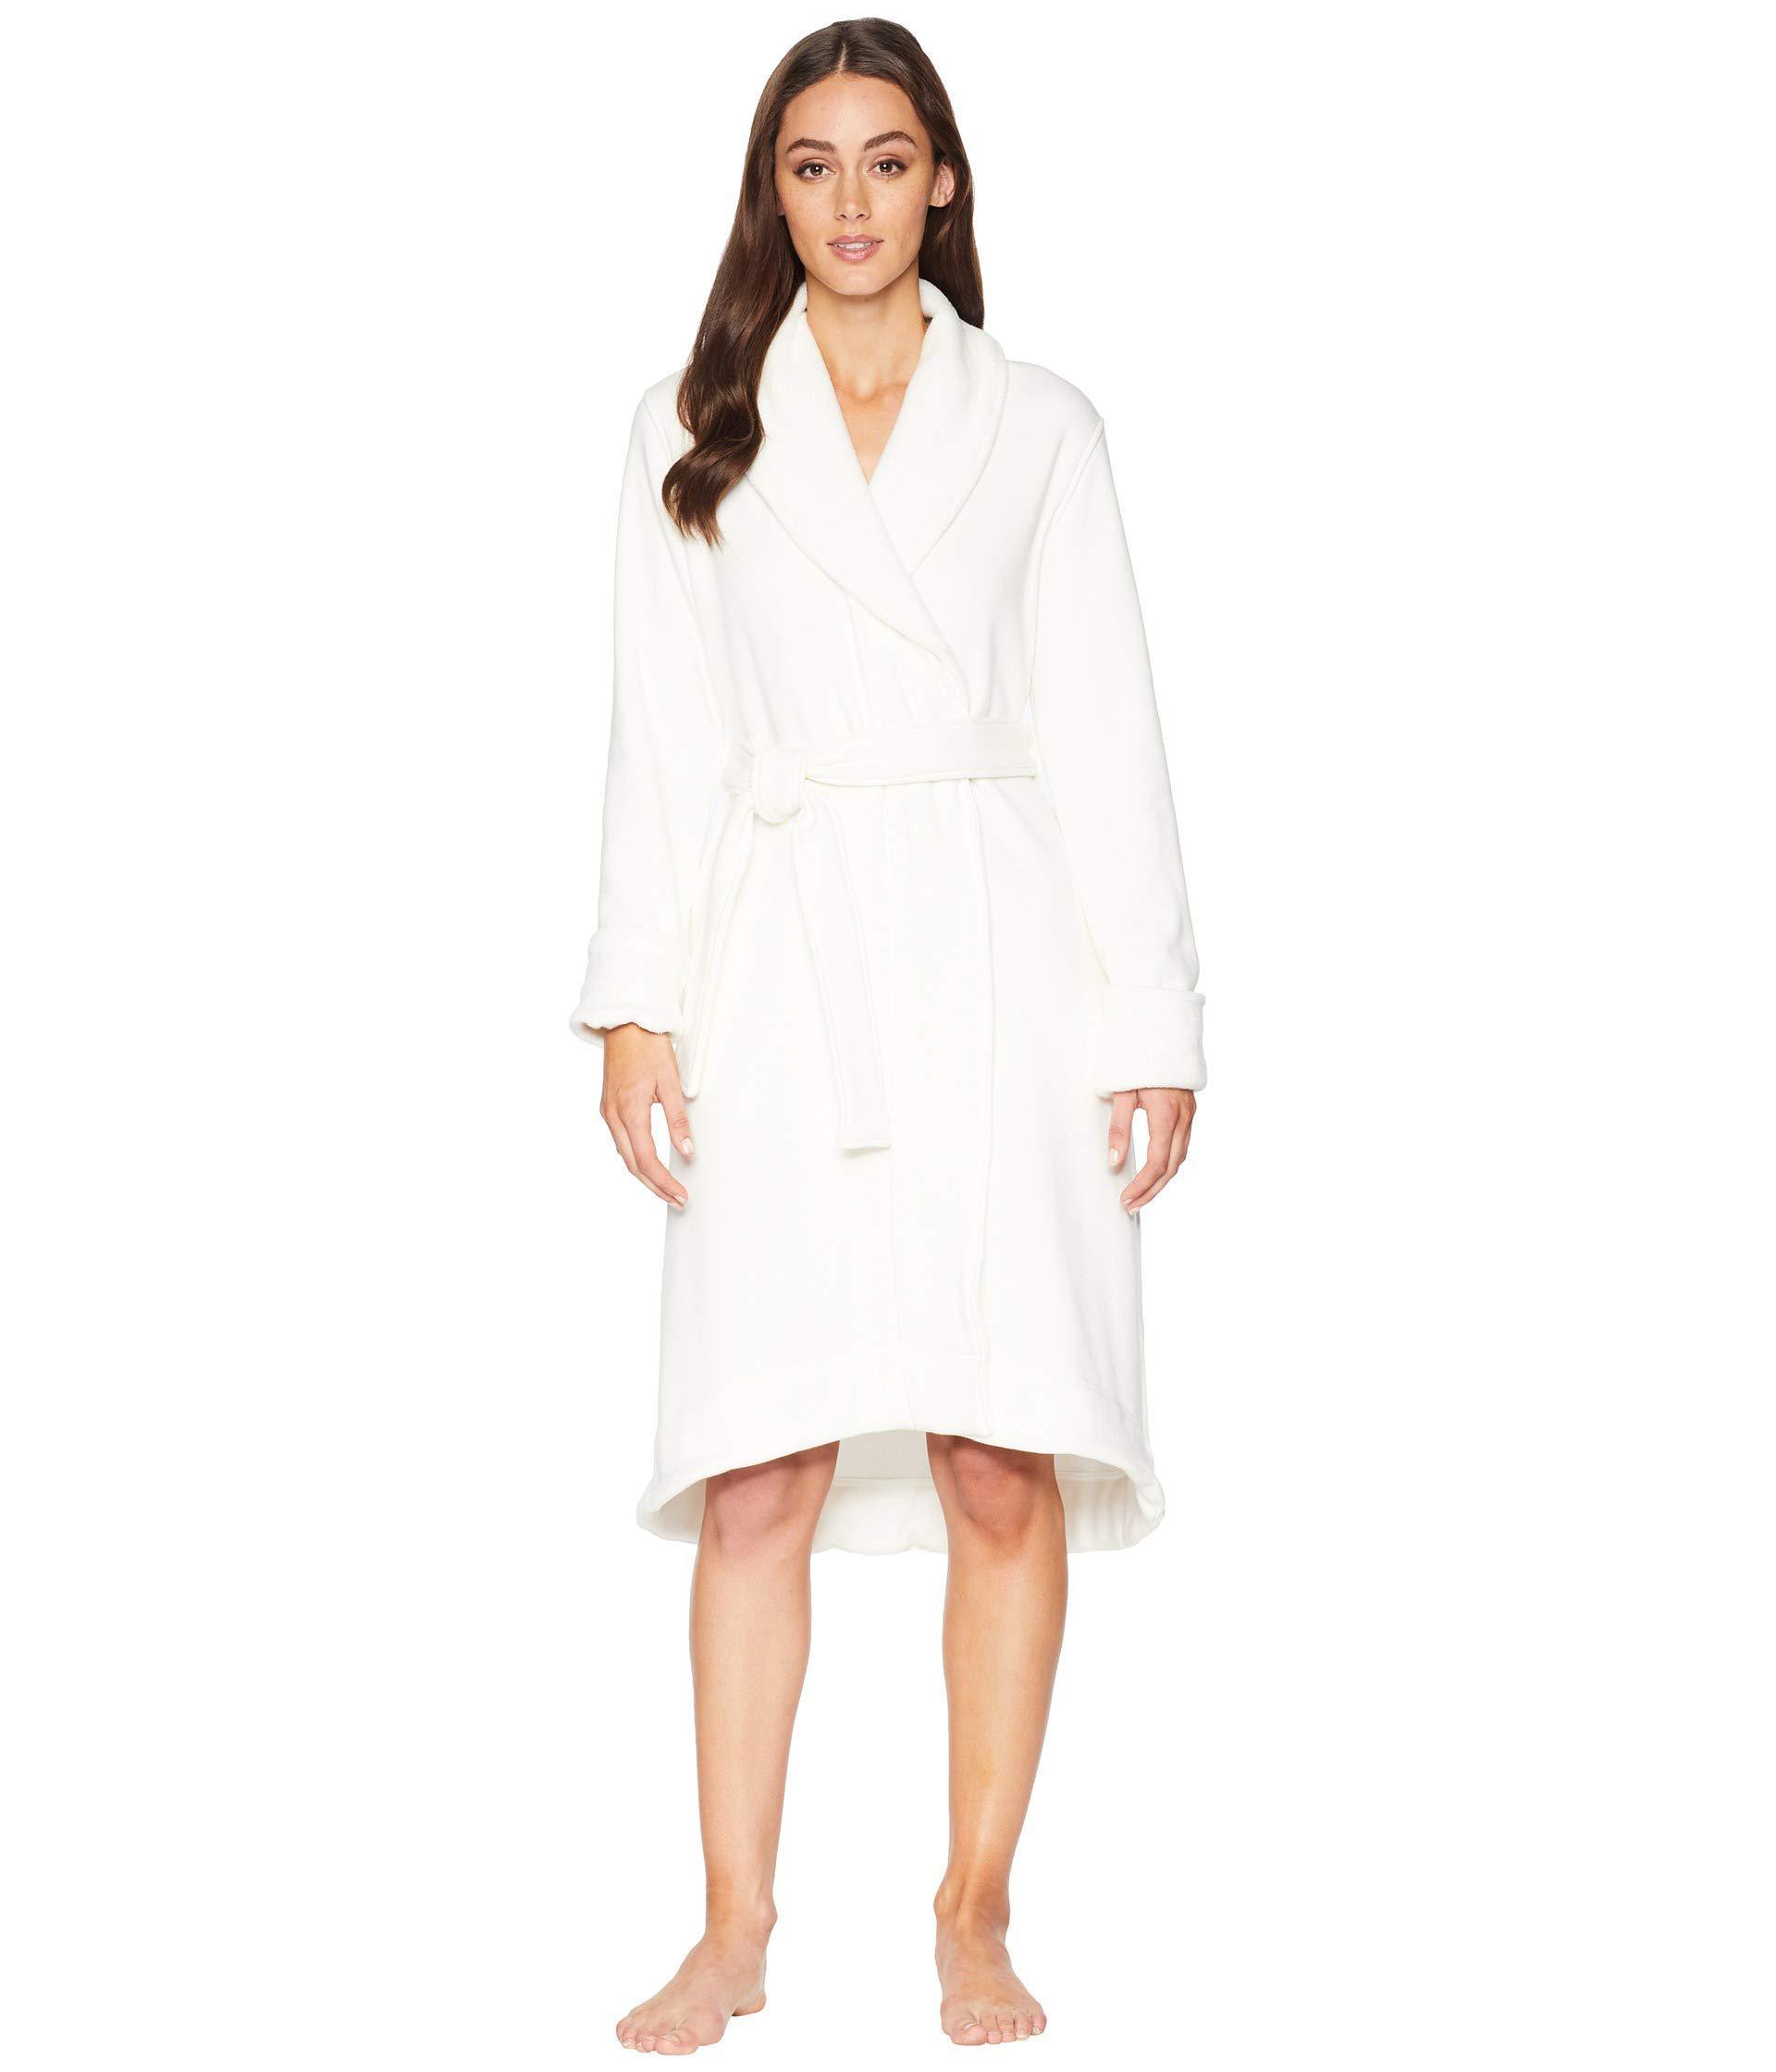 2069067aaf Lyst - UGG Duffield Ii Robe (seal Heather) Women s Robe in White